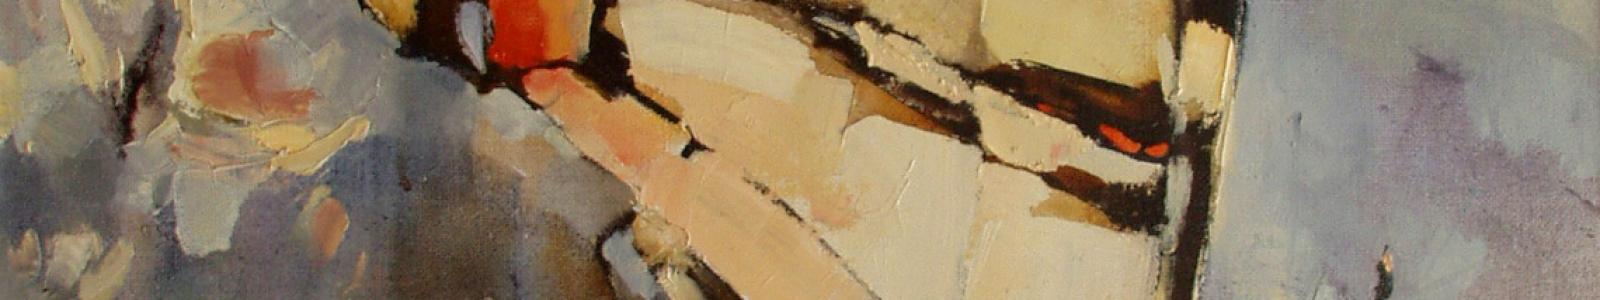 Gallery Painter Tatyana Barinova